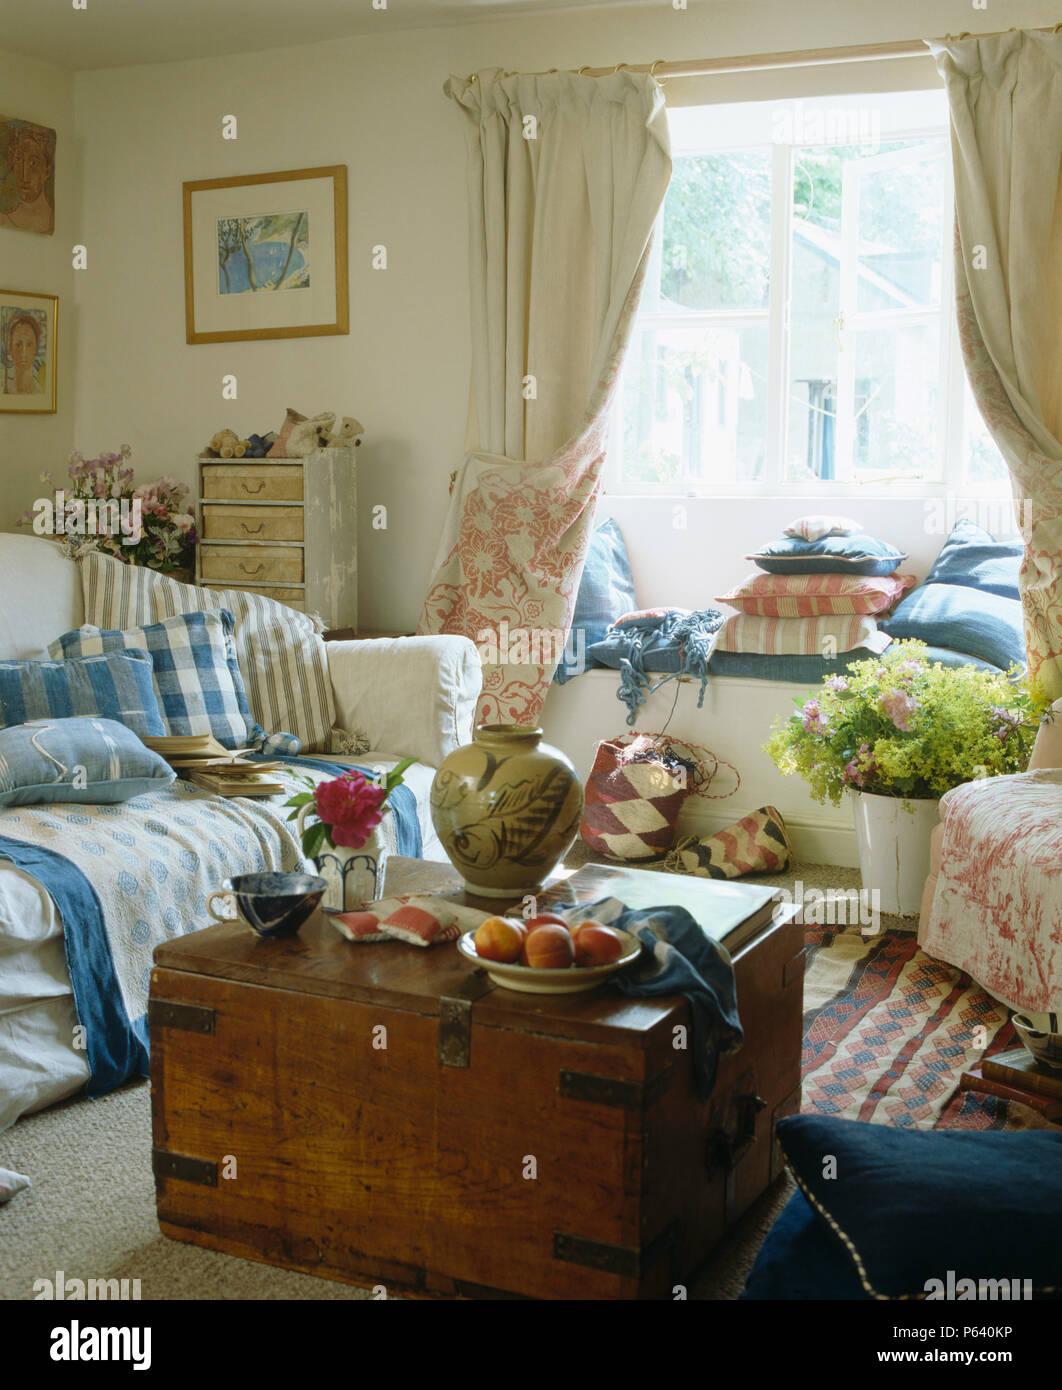 Excellent Antique Wooden Chest In Cottage Sitting Room With Blue White Uwap Interior Chair Design Uwaporg